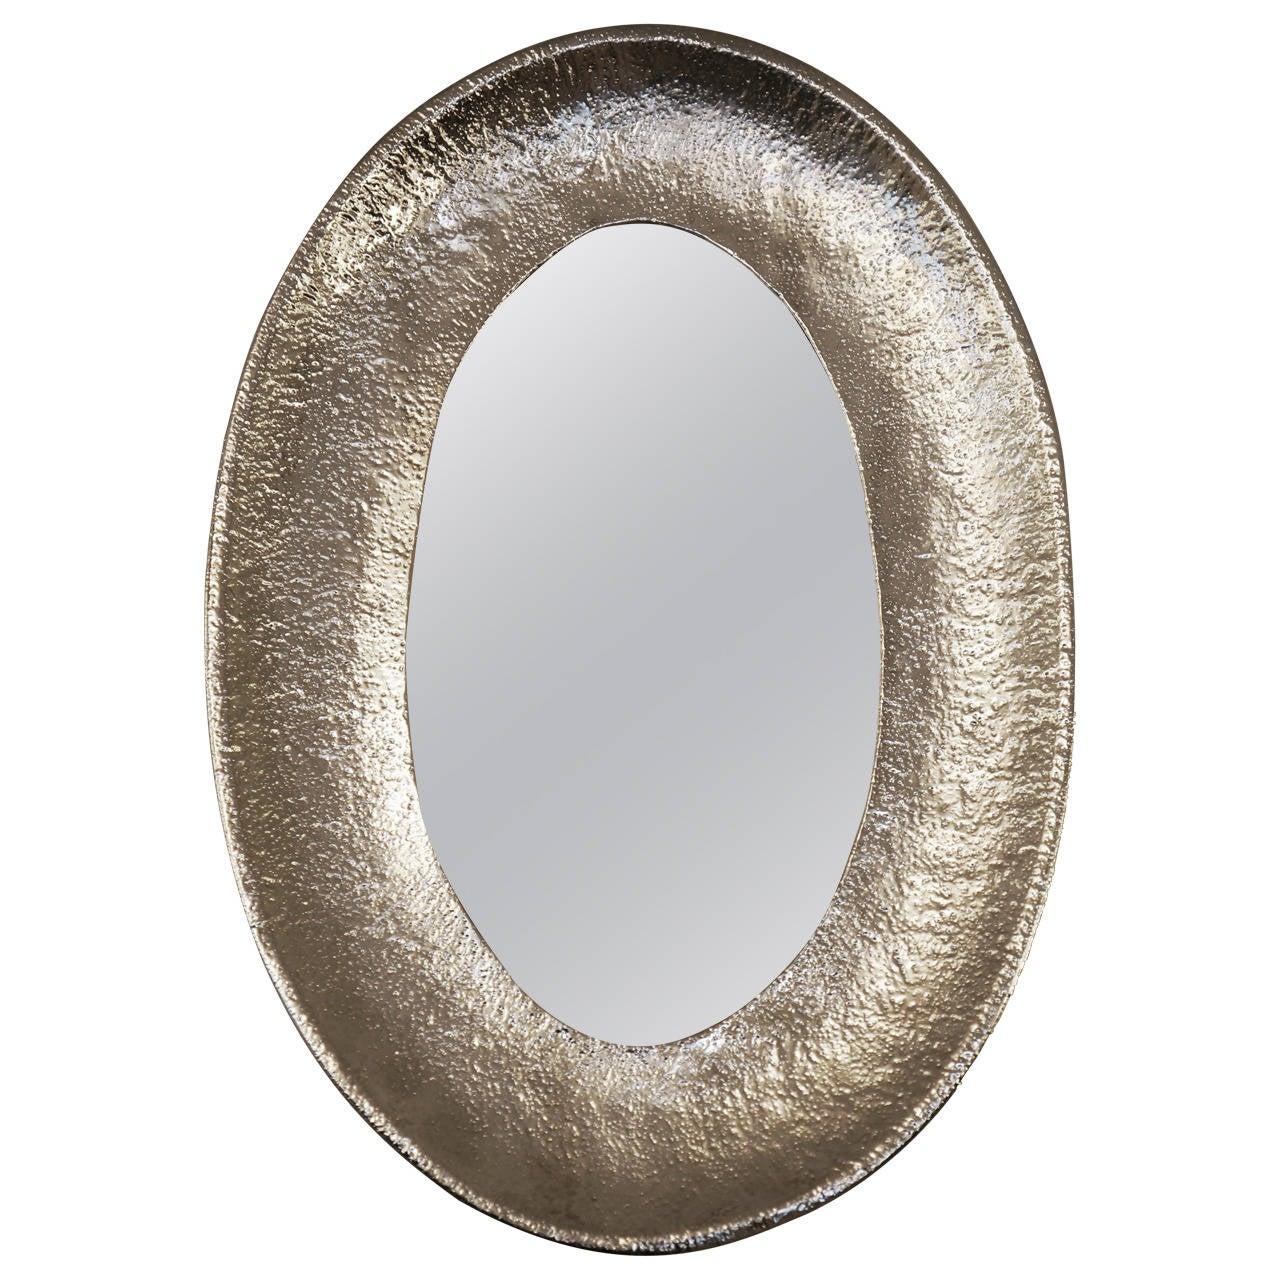 Nickel-Plated Hand-Hammered Bragalini Mirror, Italy, 1960s